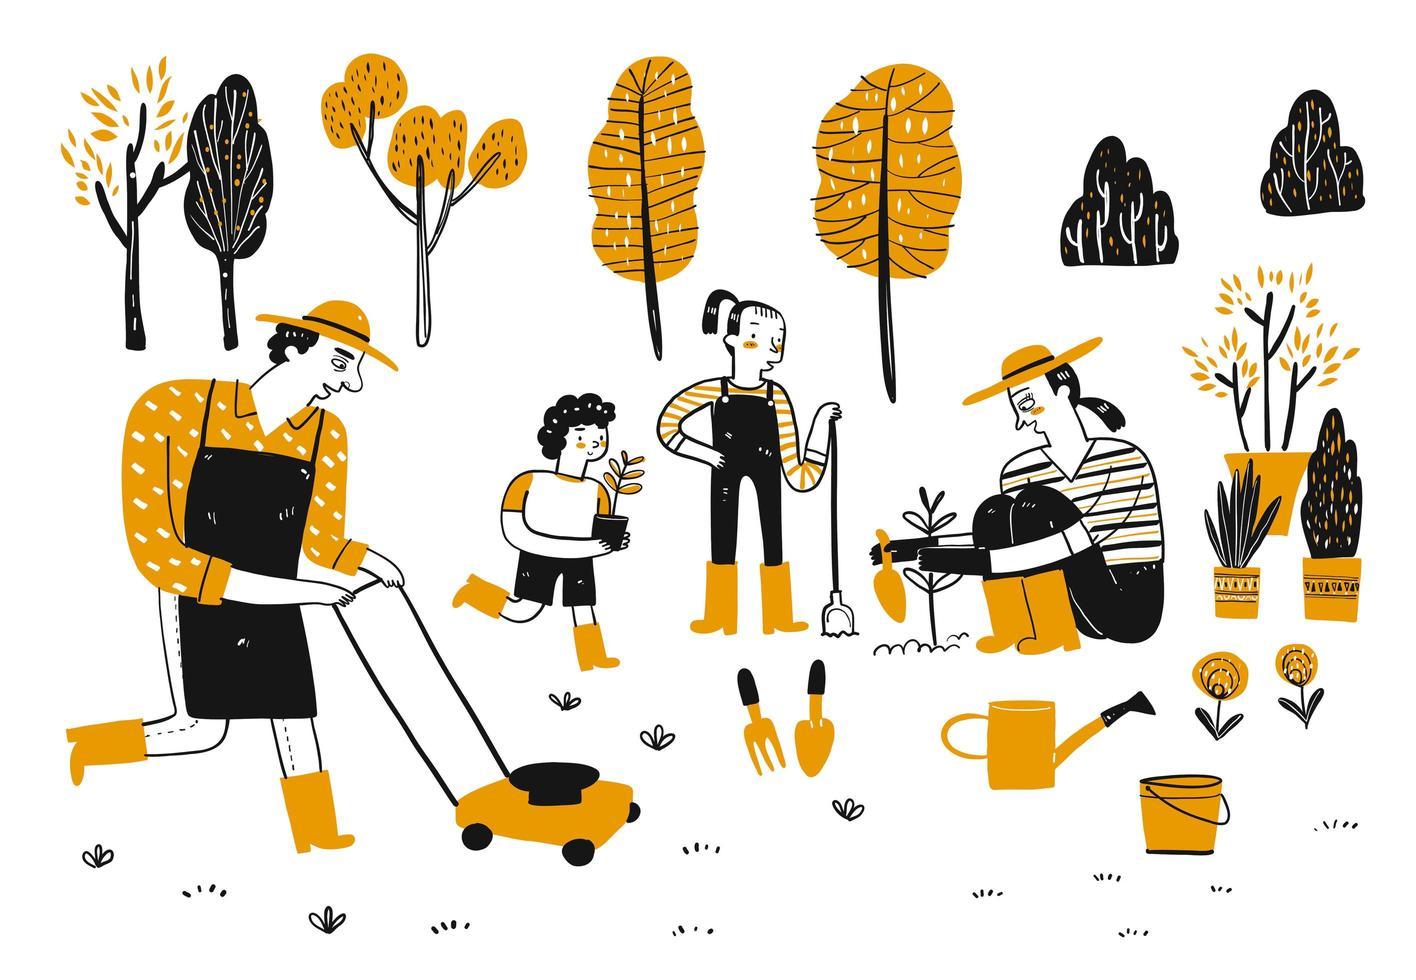 Hand drawn family gardening vector